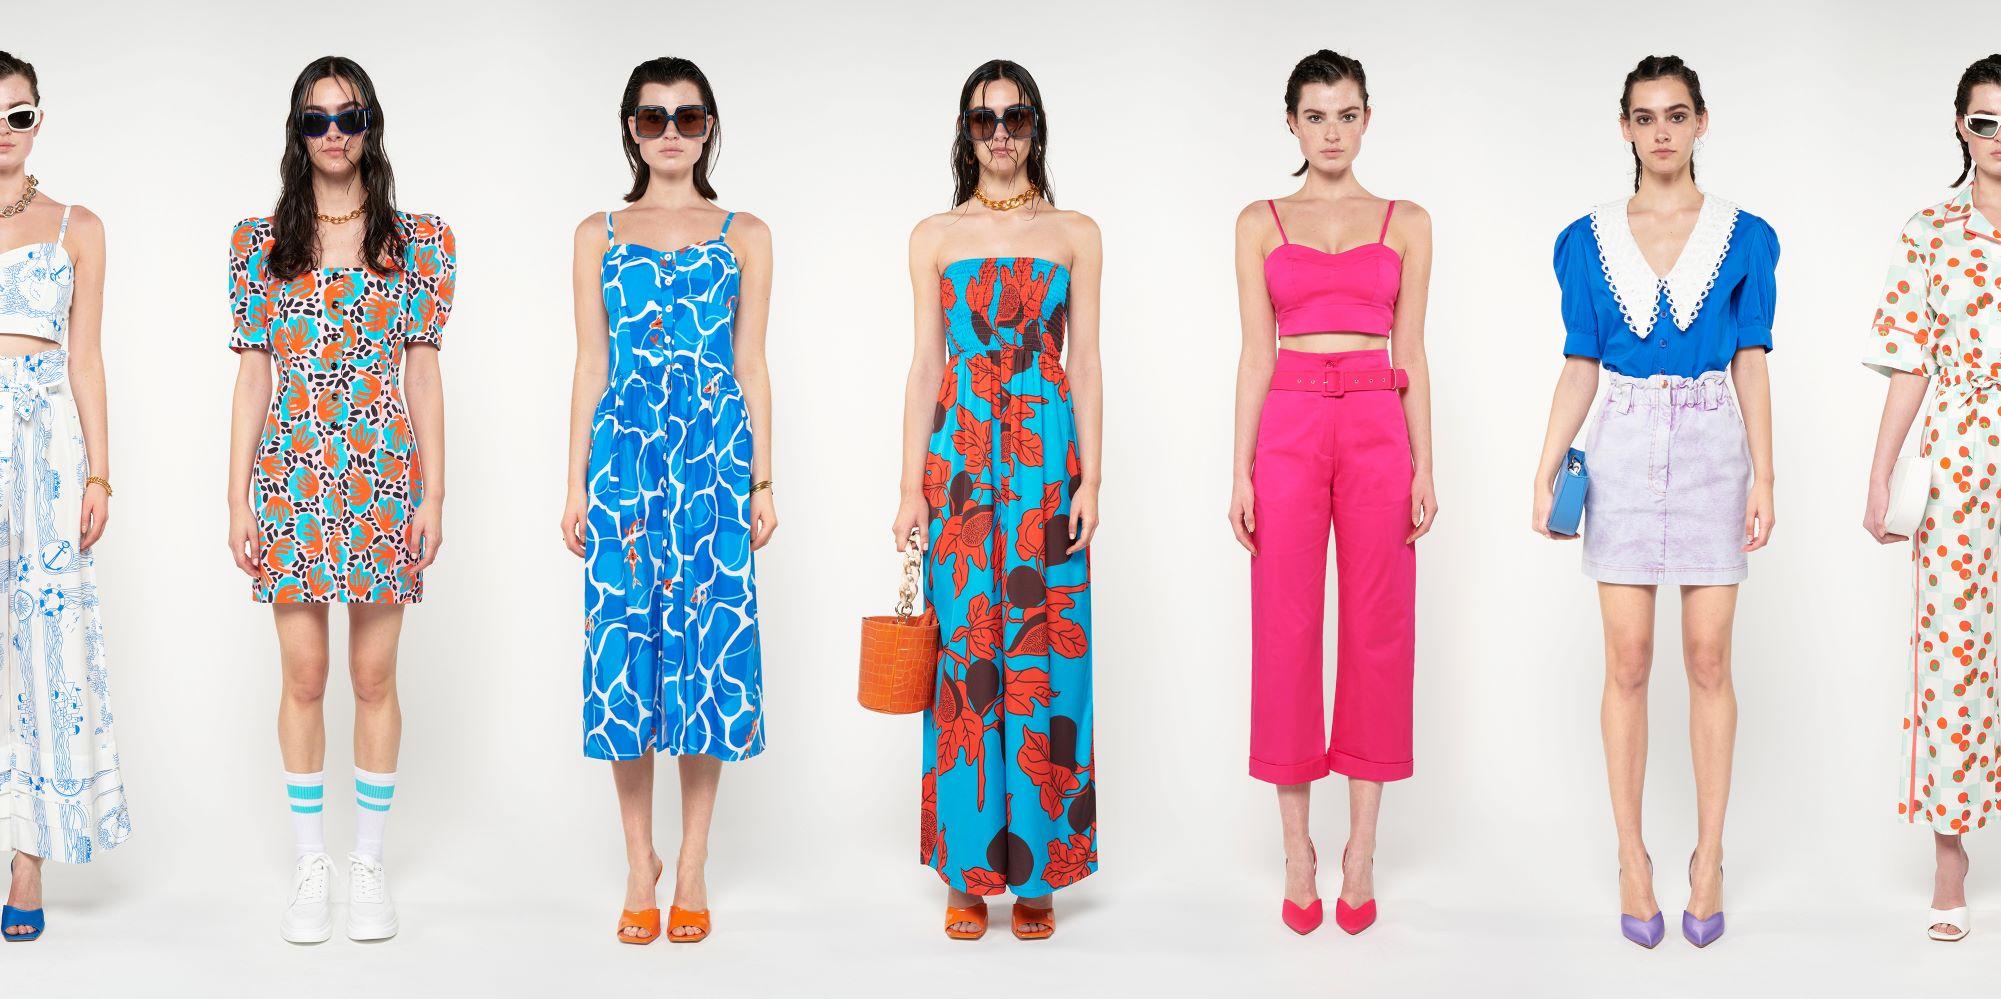 Aυτή η συλλογή ρούχων σε κάνει να νοσταλγείς τα καλοκαίρια της νιότης σου, τα καλοκαίρια των 90s…